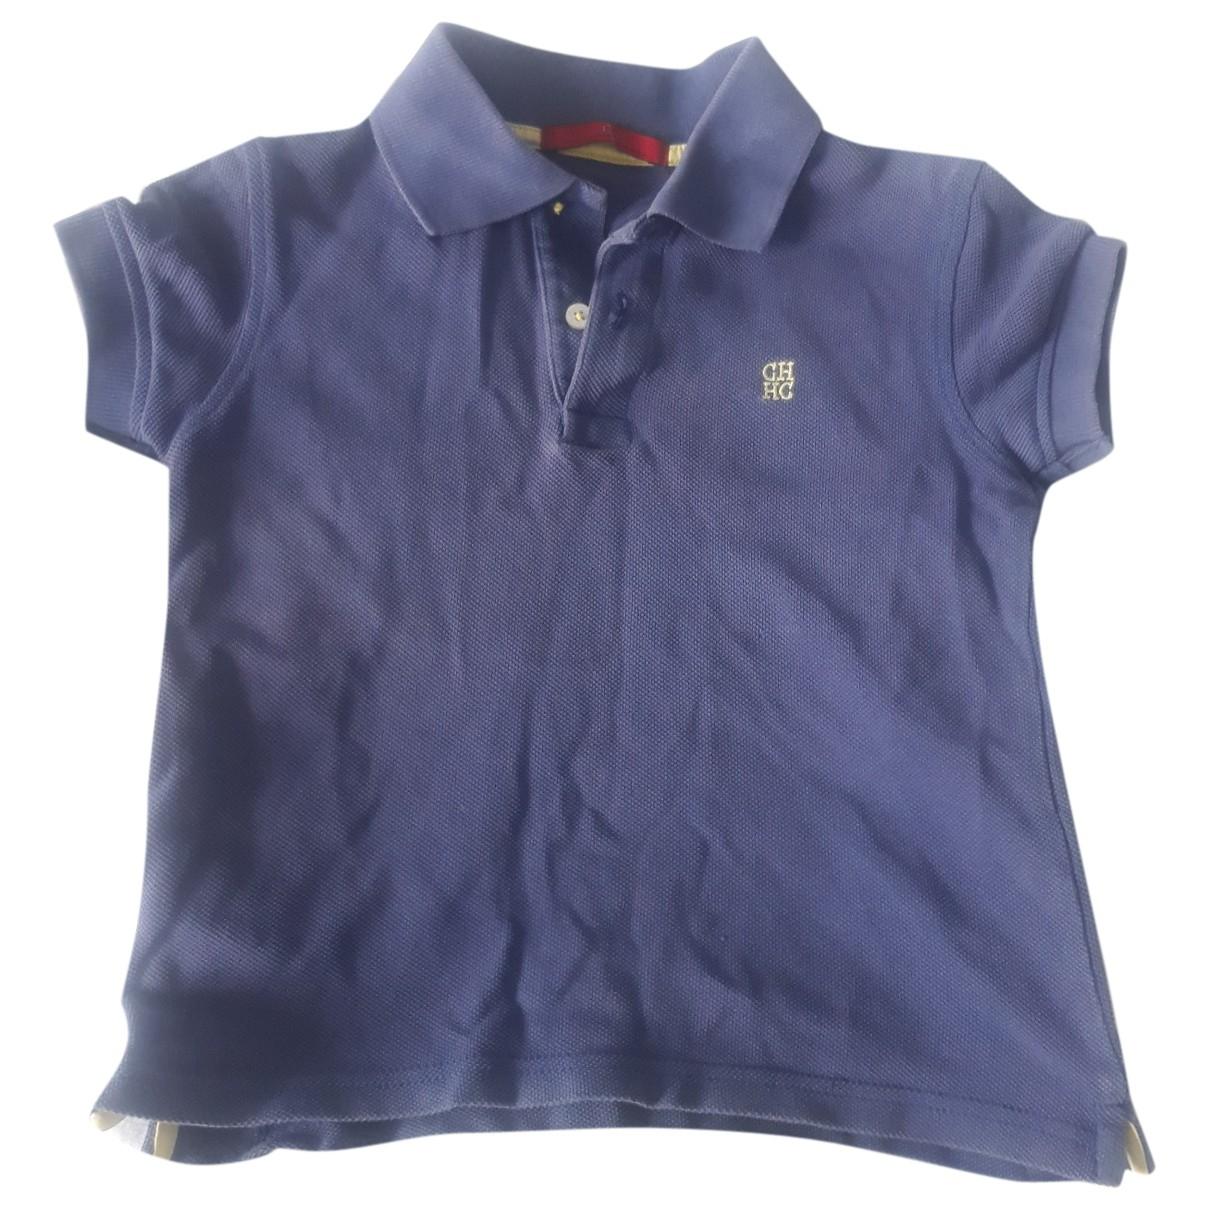 Carolina Herrera \N Blue Cotton  top for Kids 4 years - up to 102cm FR